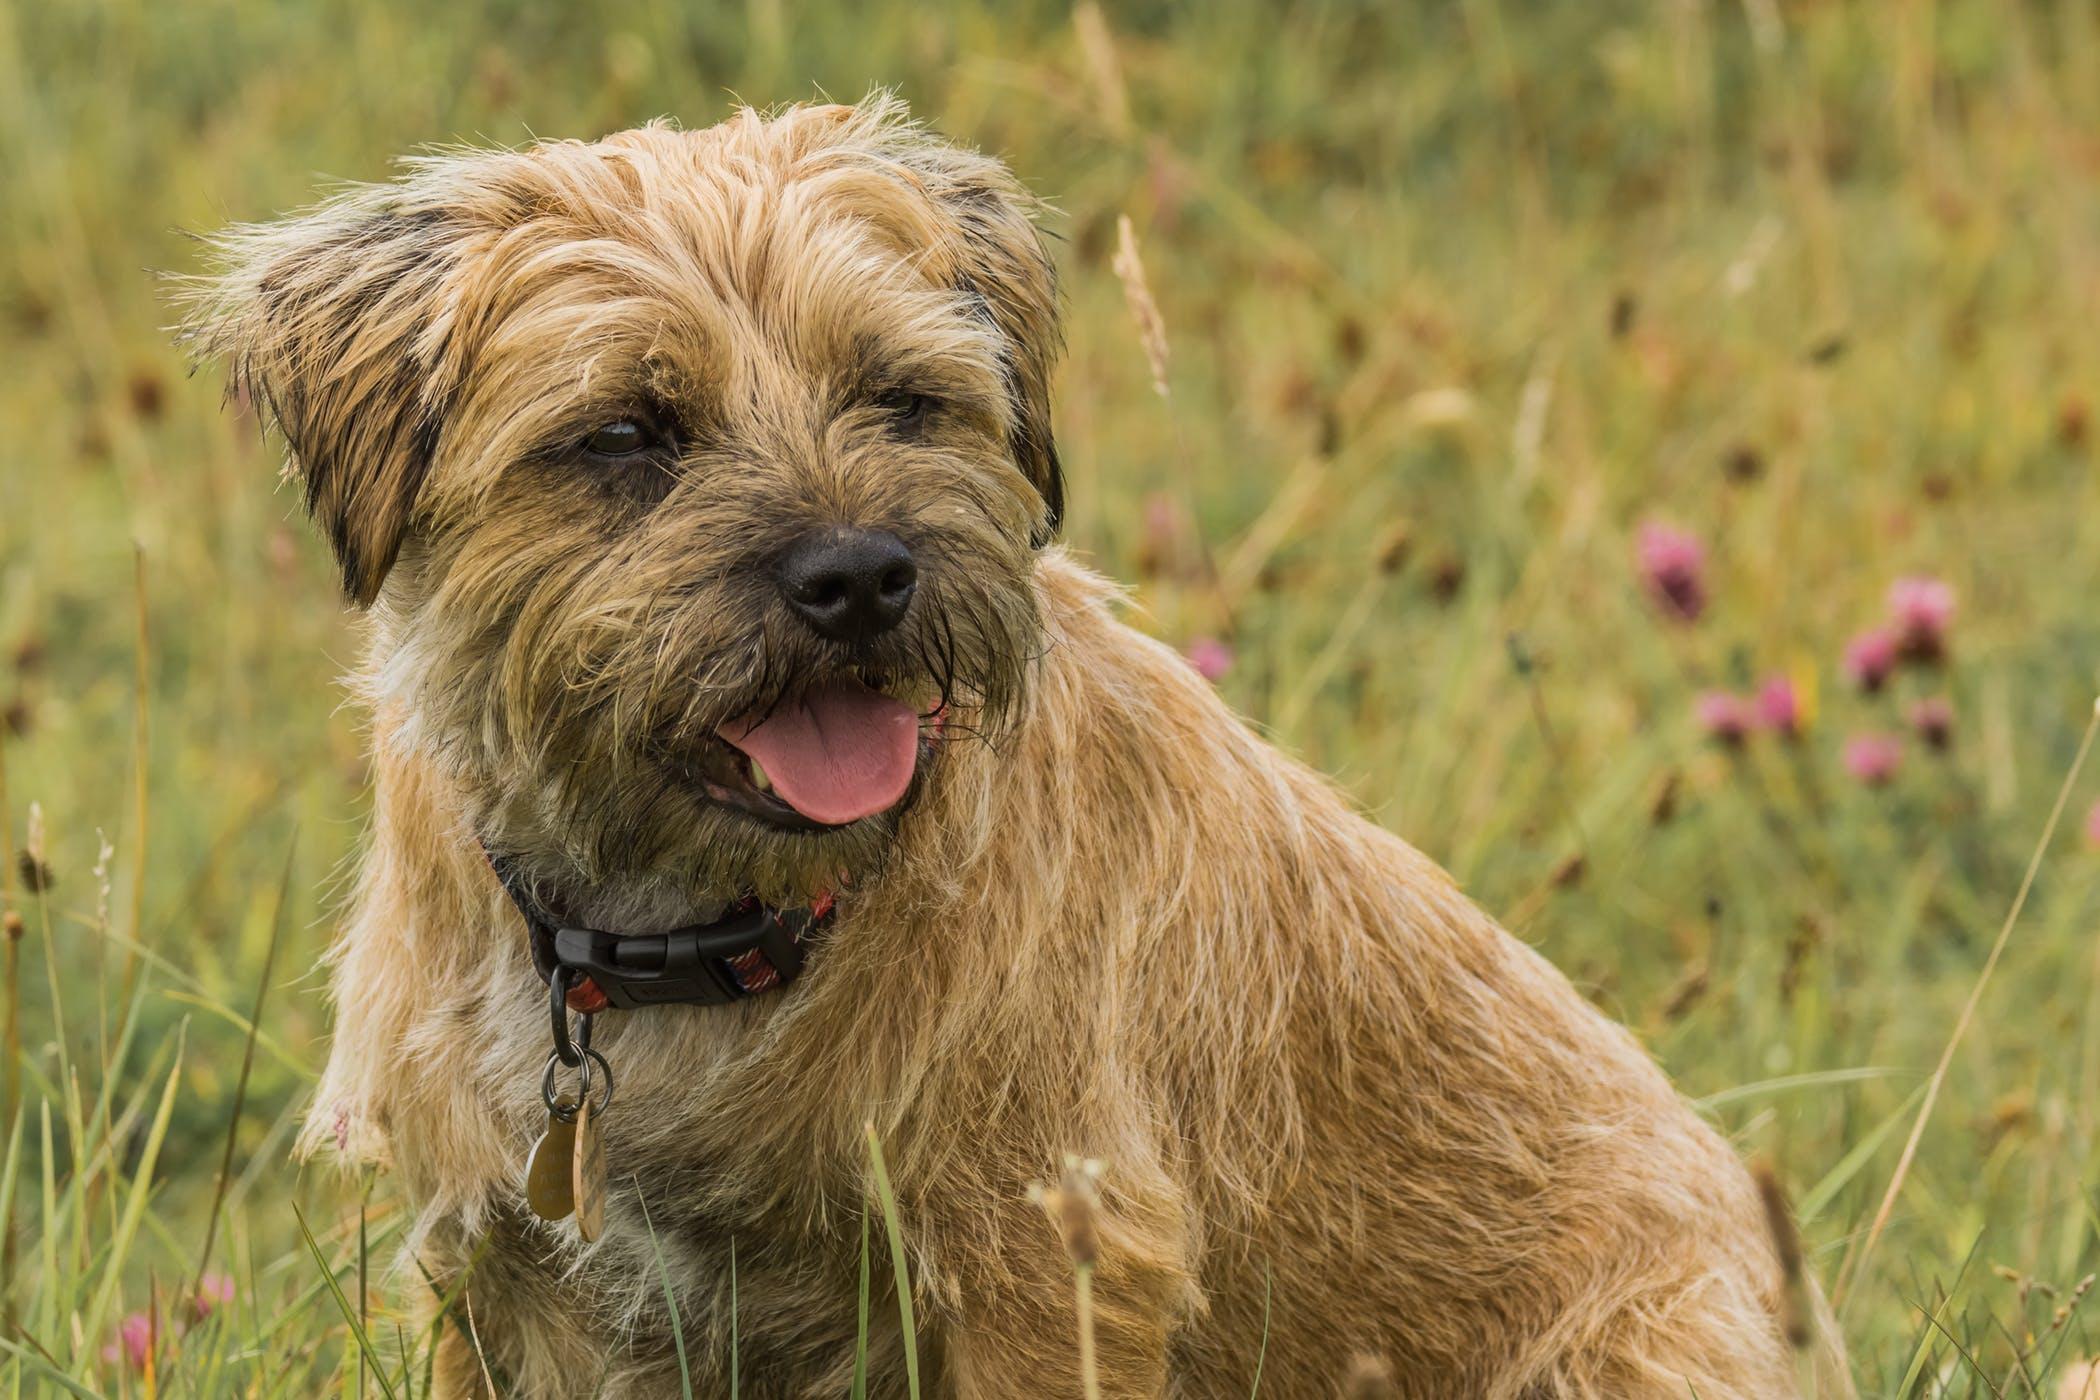 Methicillin-Resistant Staphylococcus Aureus in Dogs - Symptoms